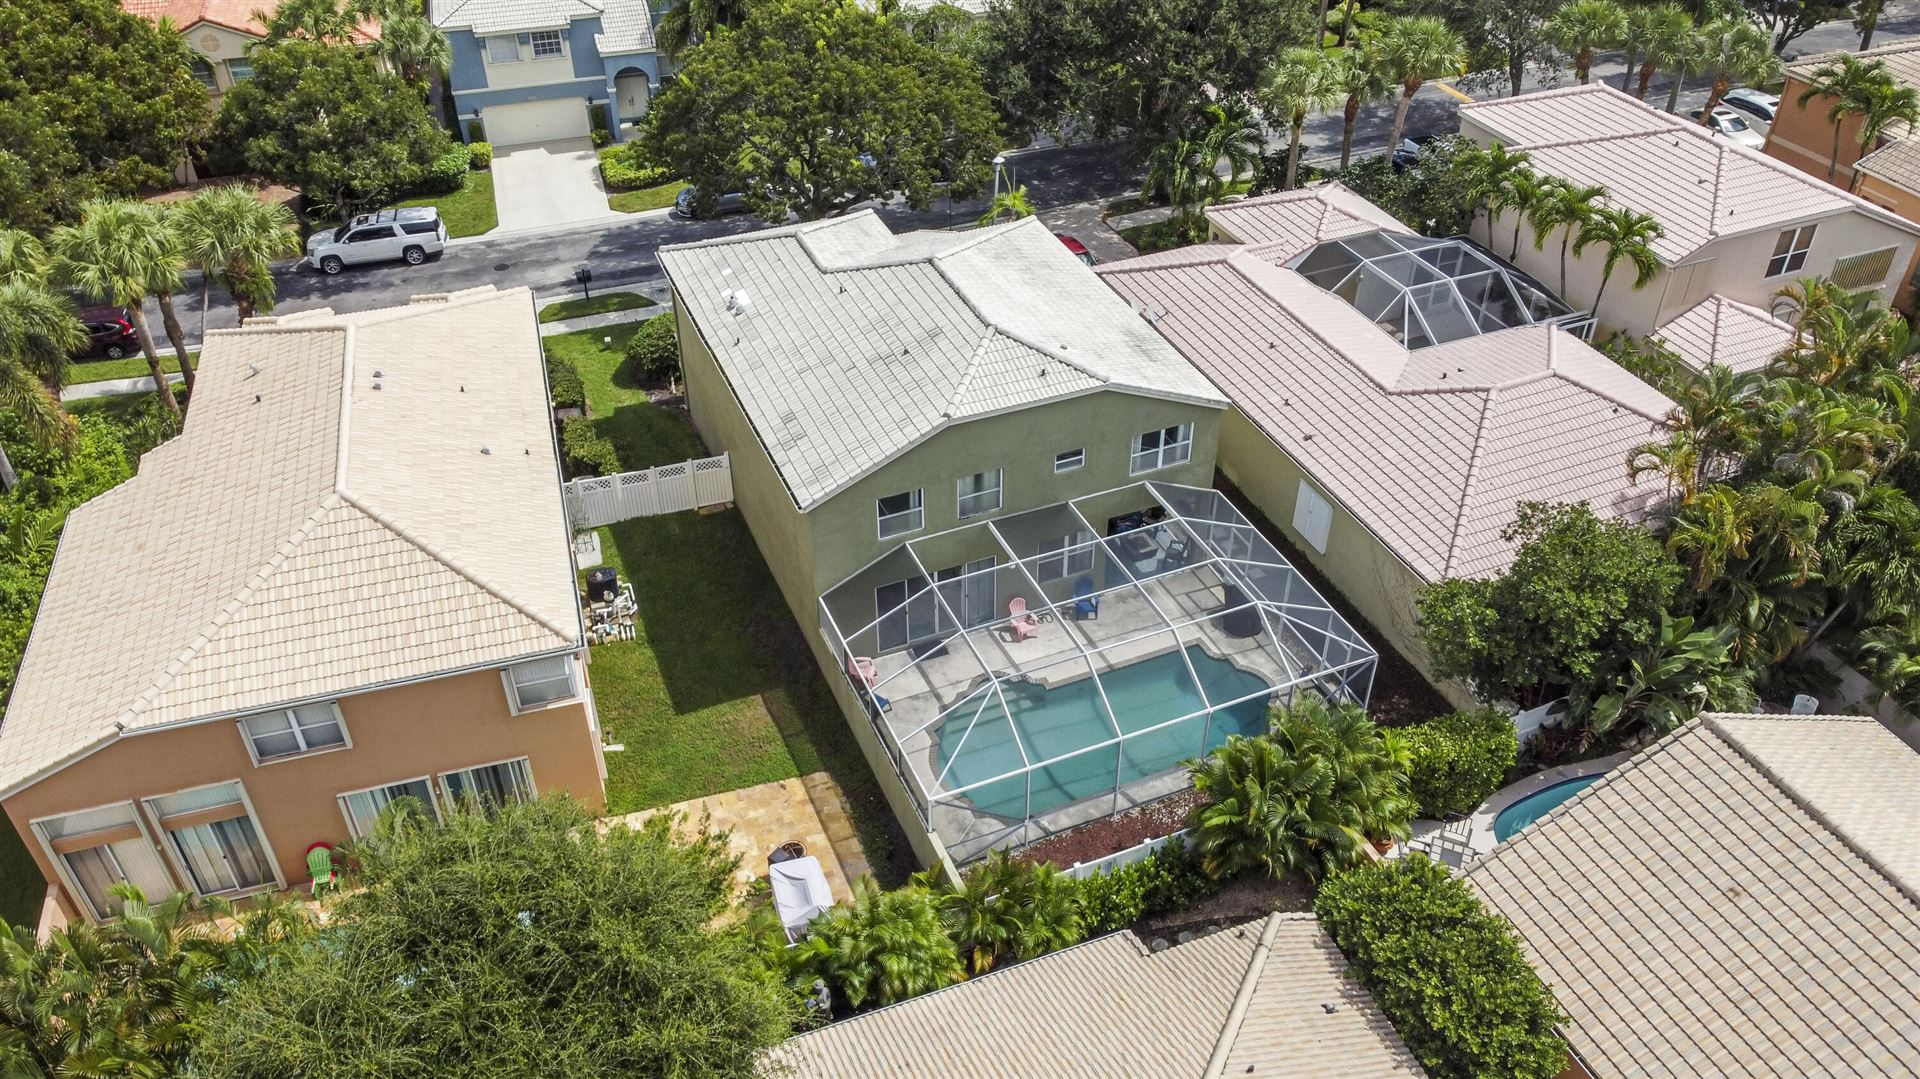 Photo of 2087 Chagall Circle, West Palm Beach, FL 33409 (MLS # RX-10752484)